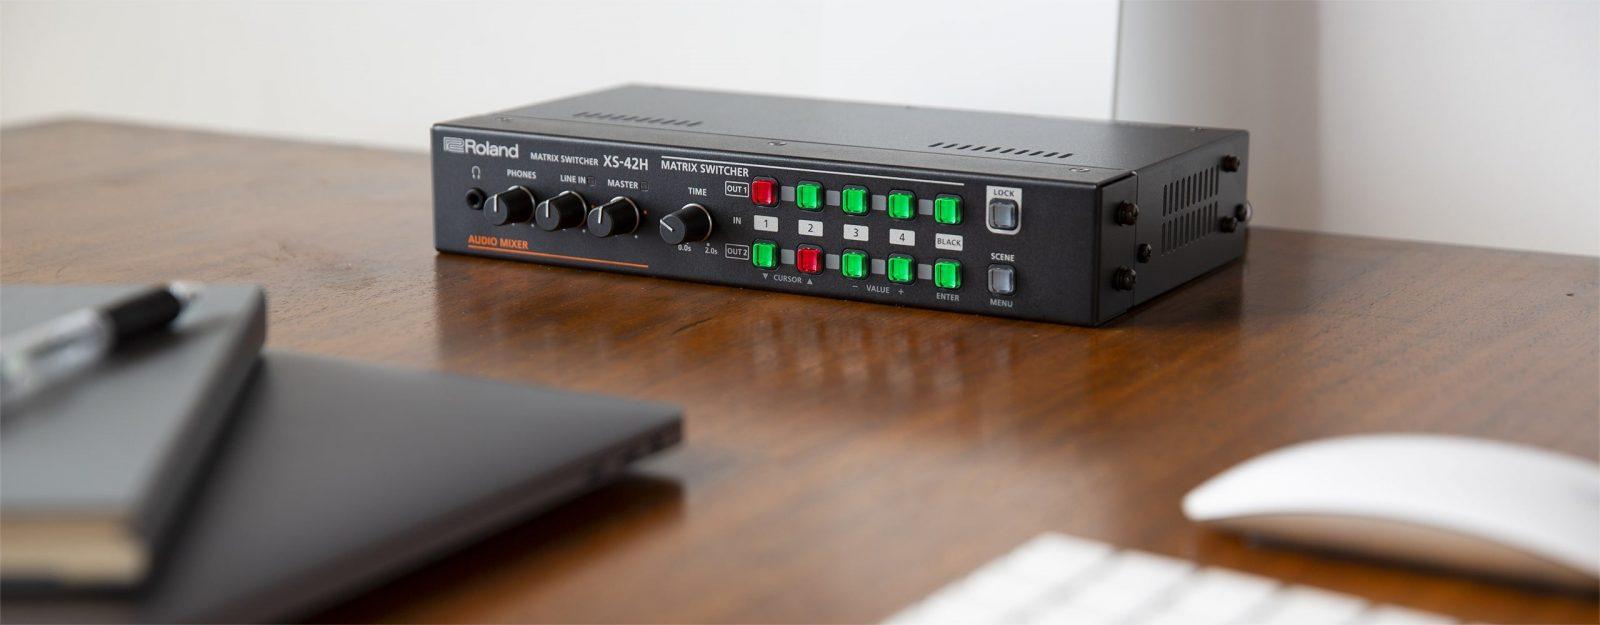 Roland XS-42H on Desk